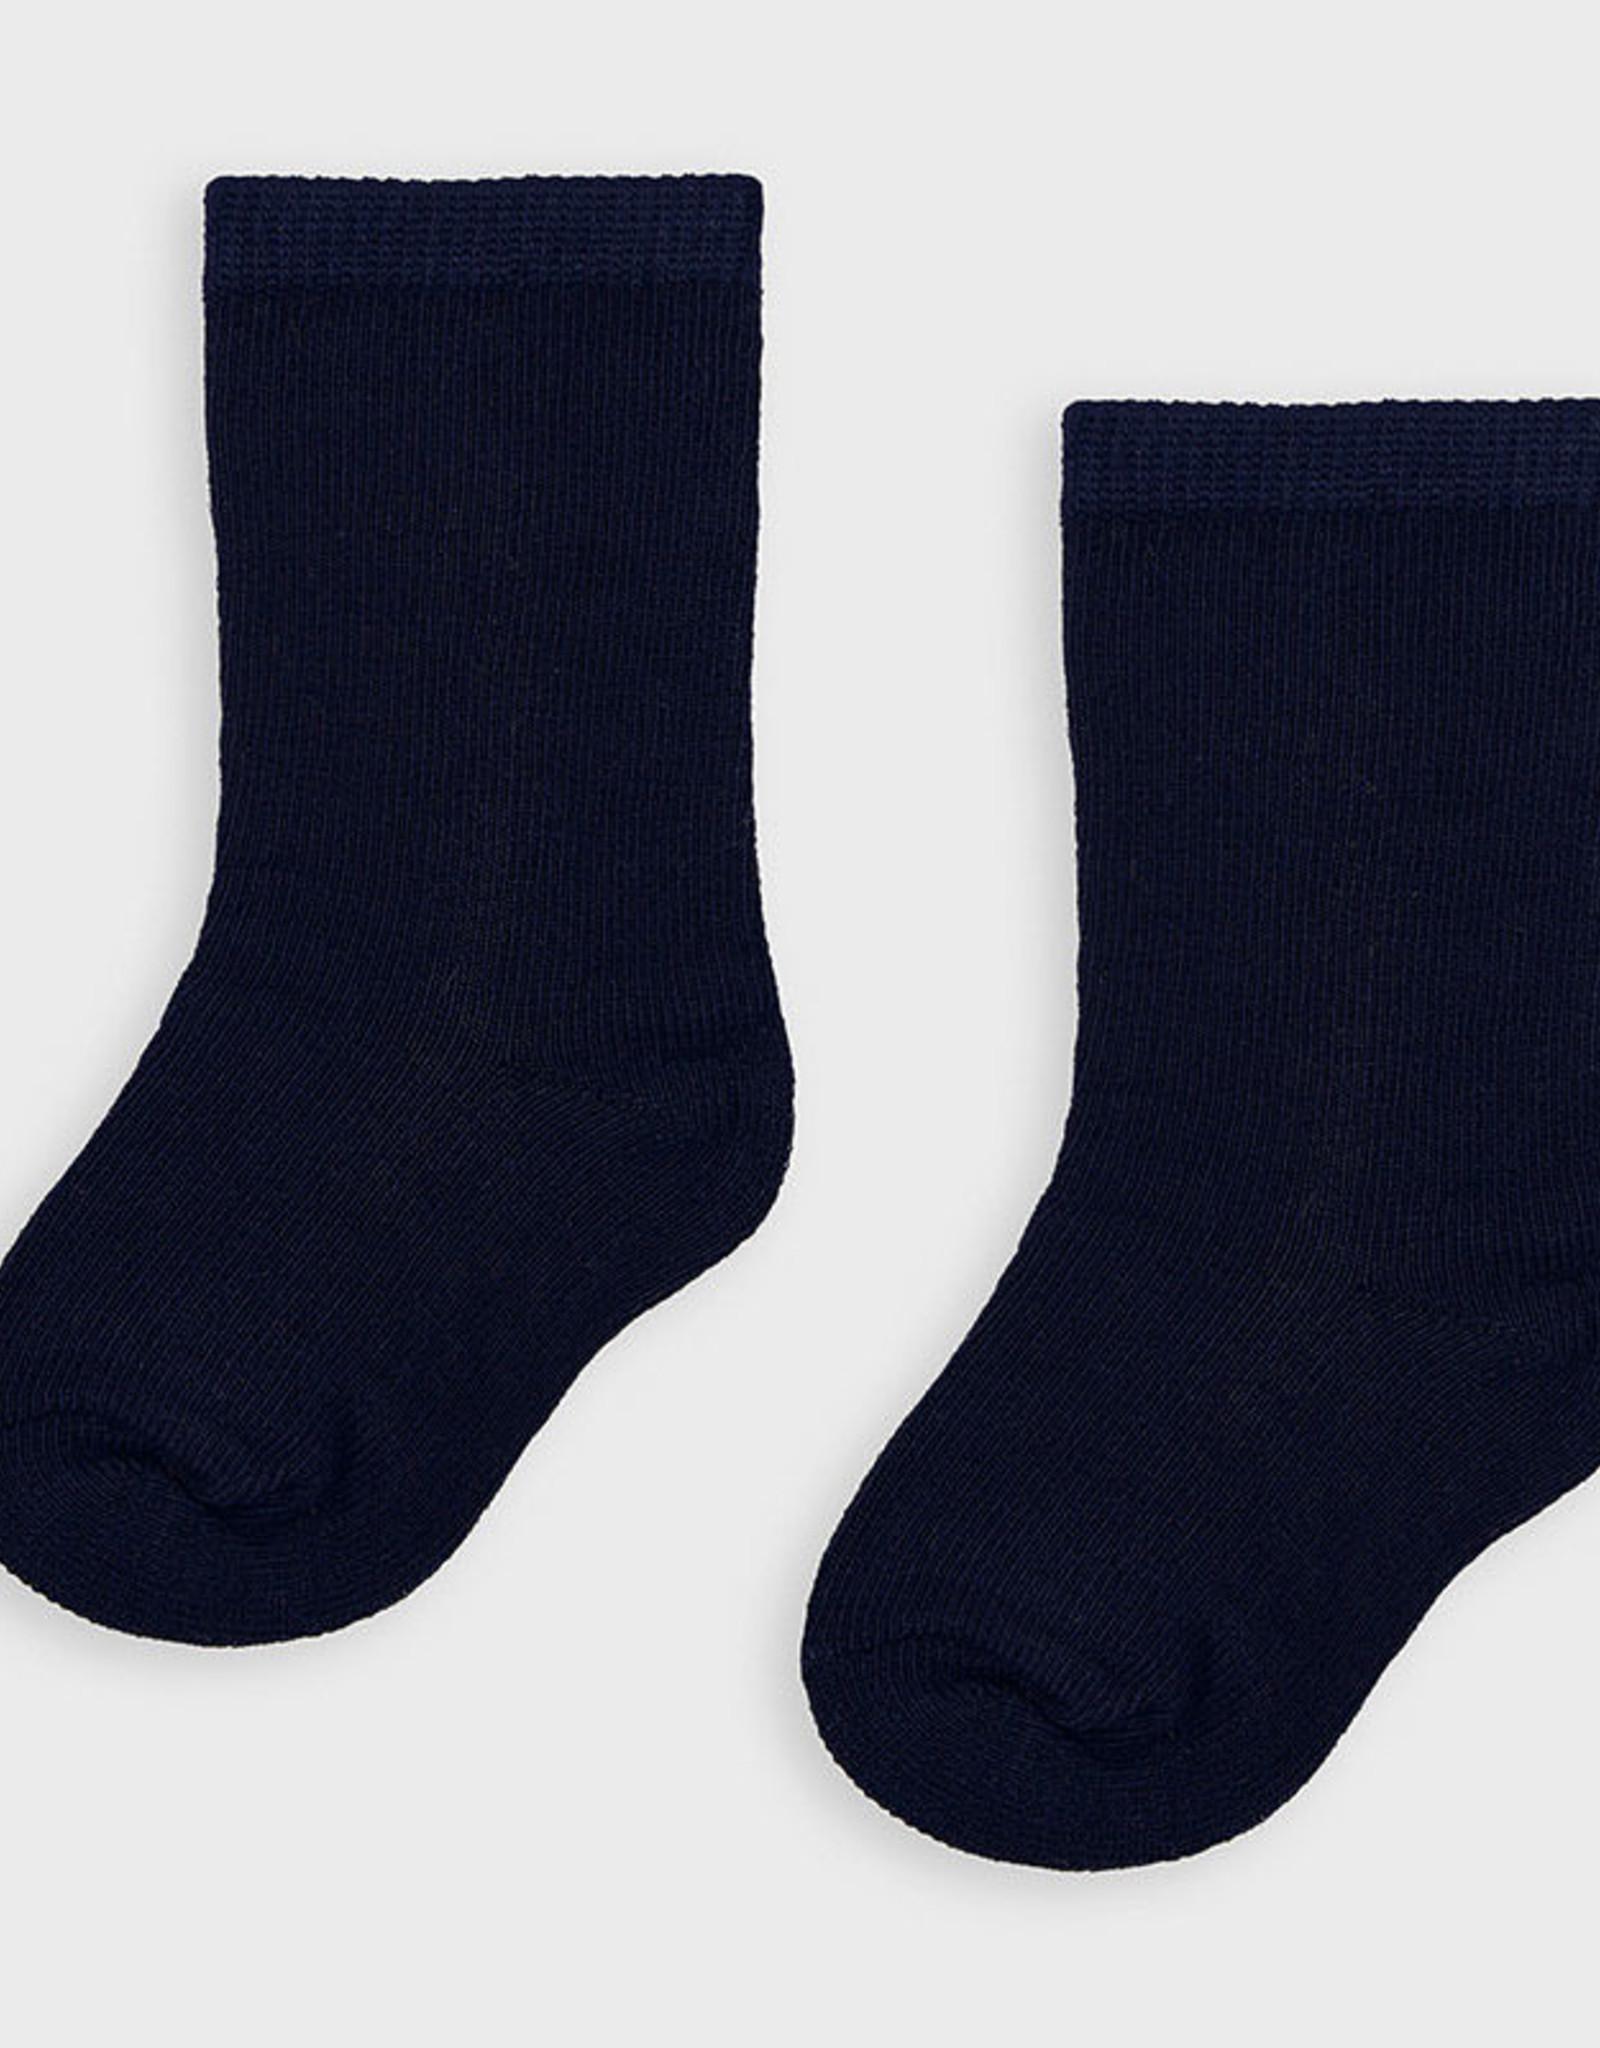 Mayoral Mayoral Mid-Length Socks Baby Boy